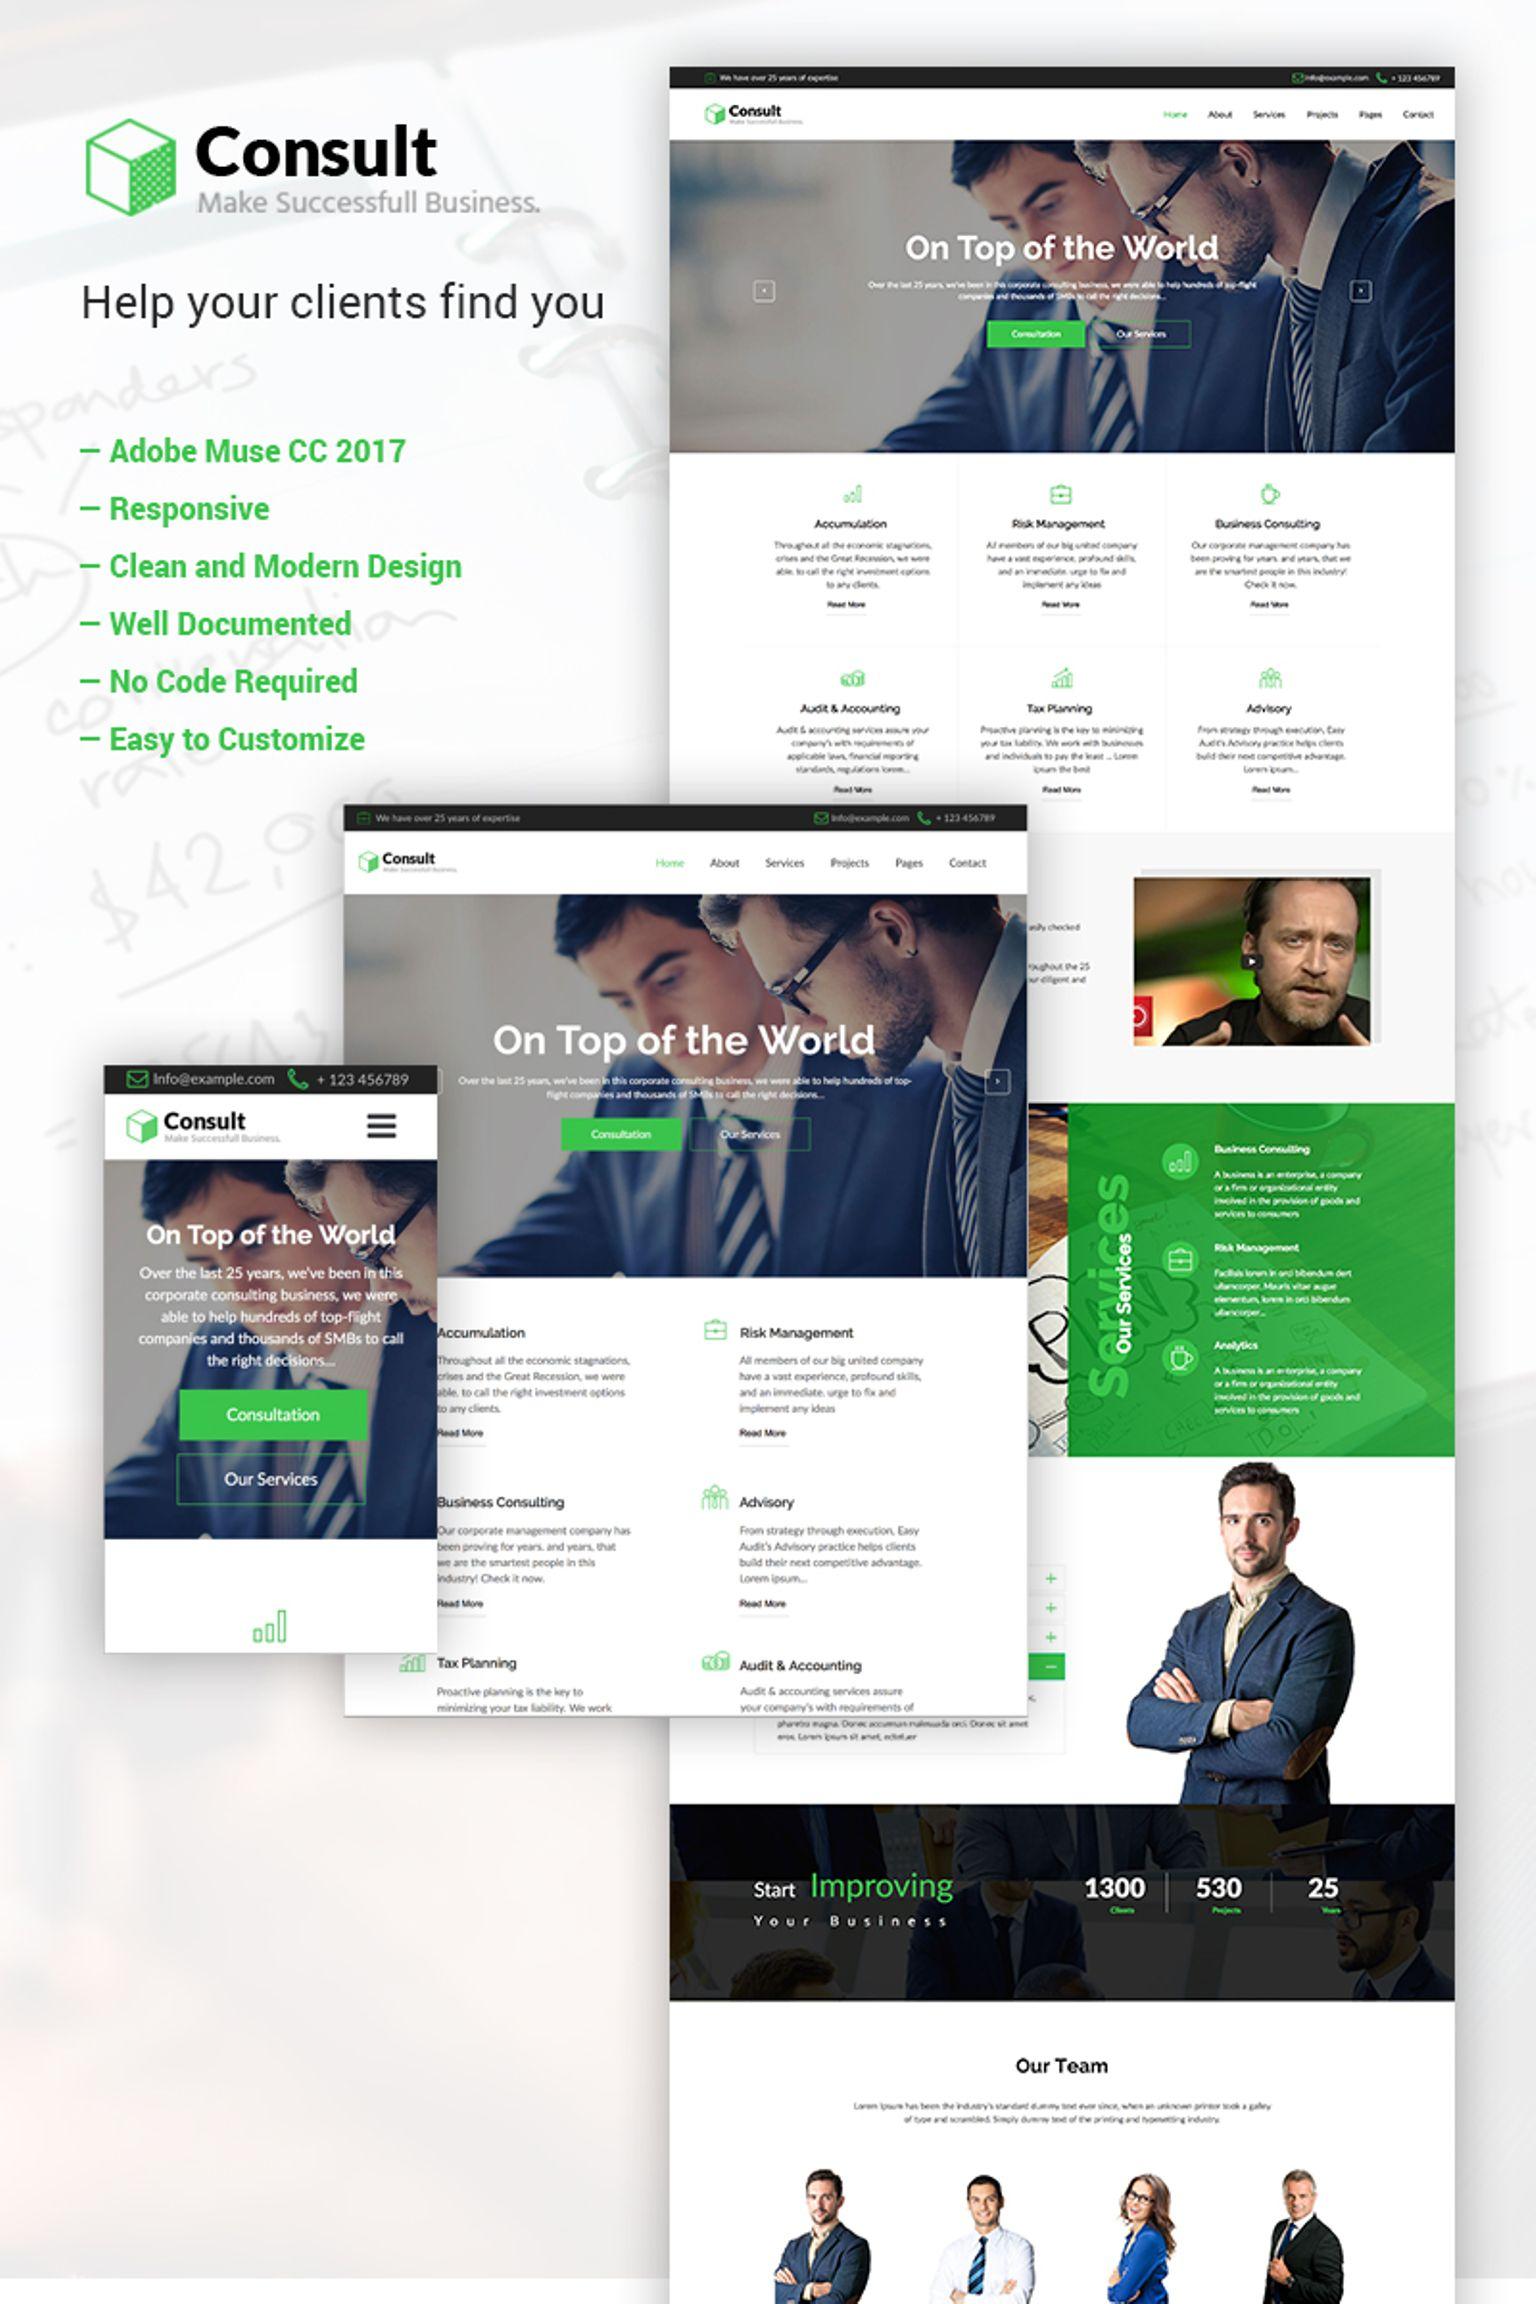 Consult - Business Consulting Adobe CC 2017 №64982